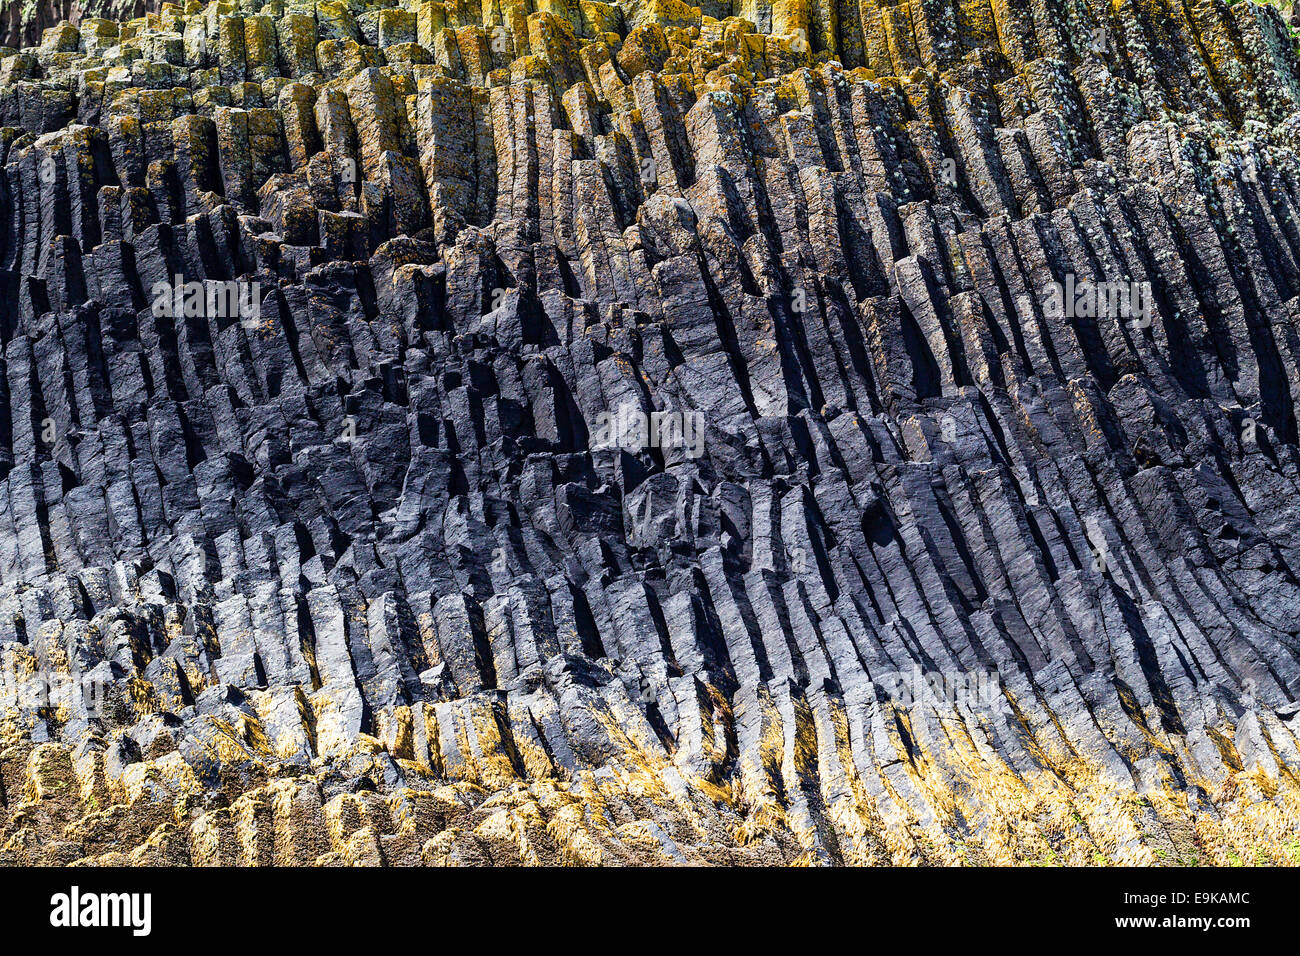 Säulenförmigen Basaltformationen auf der Insel Staffa in der inneren Hebrdes, Schottland Stockbild